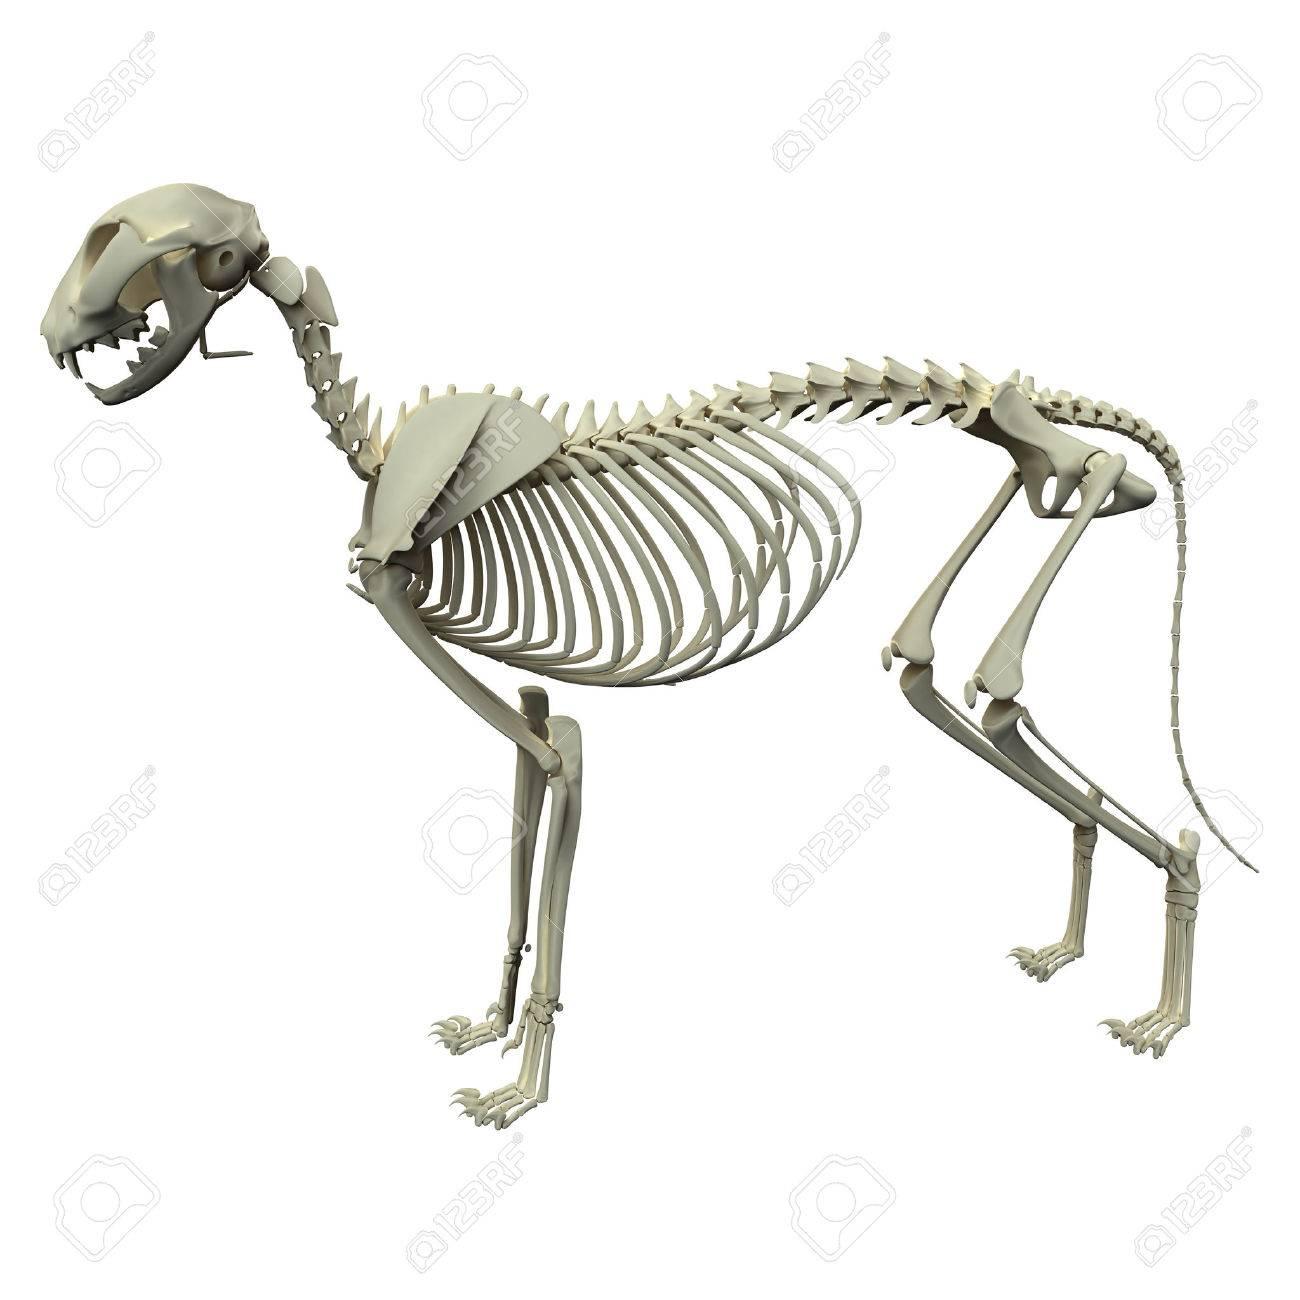 Dog Skeleton Anatomy - Anatomy Of A Male Dog Skeleton Stock Photo ...